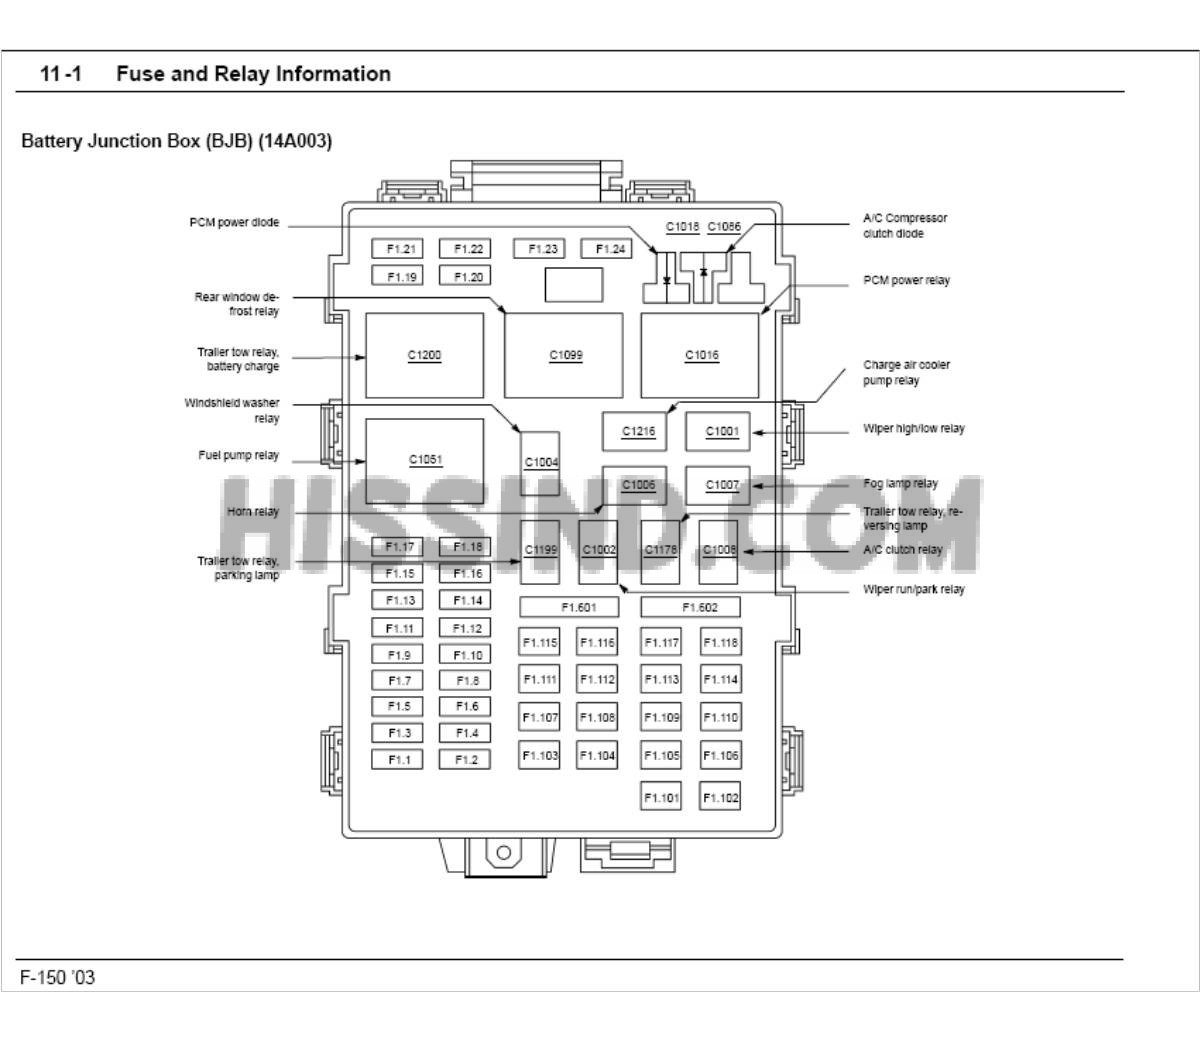 2004 F150 Heritage Wiring Diagram